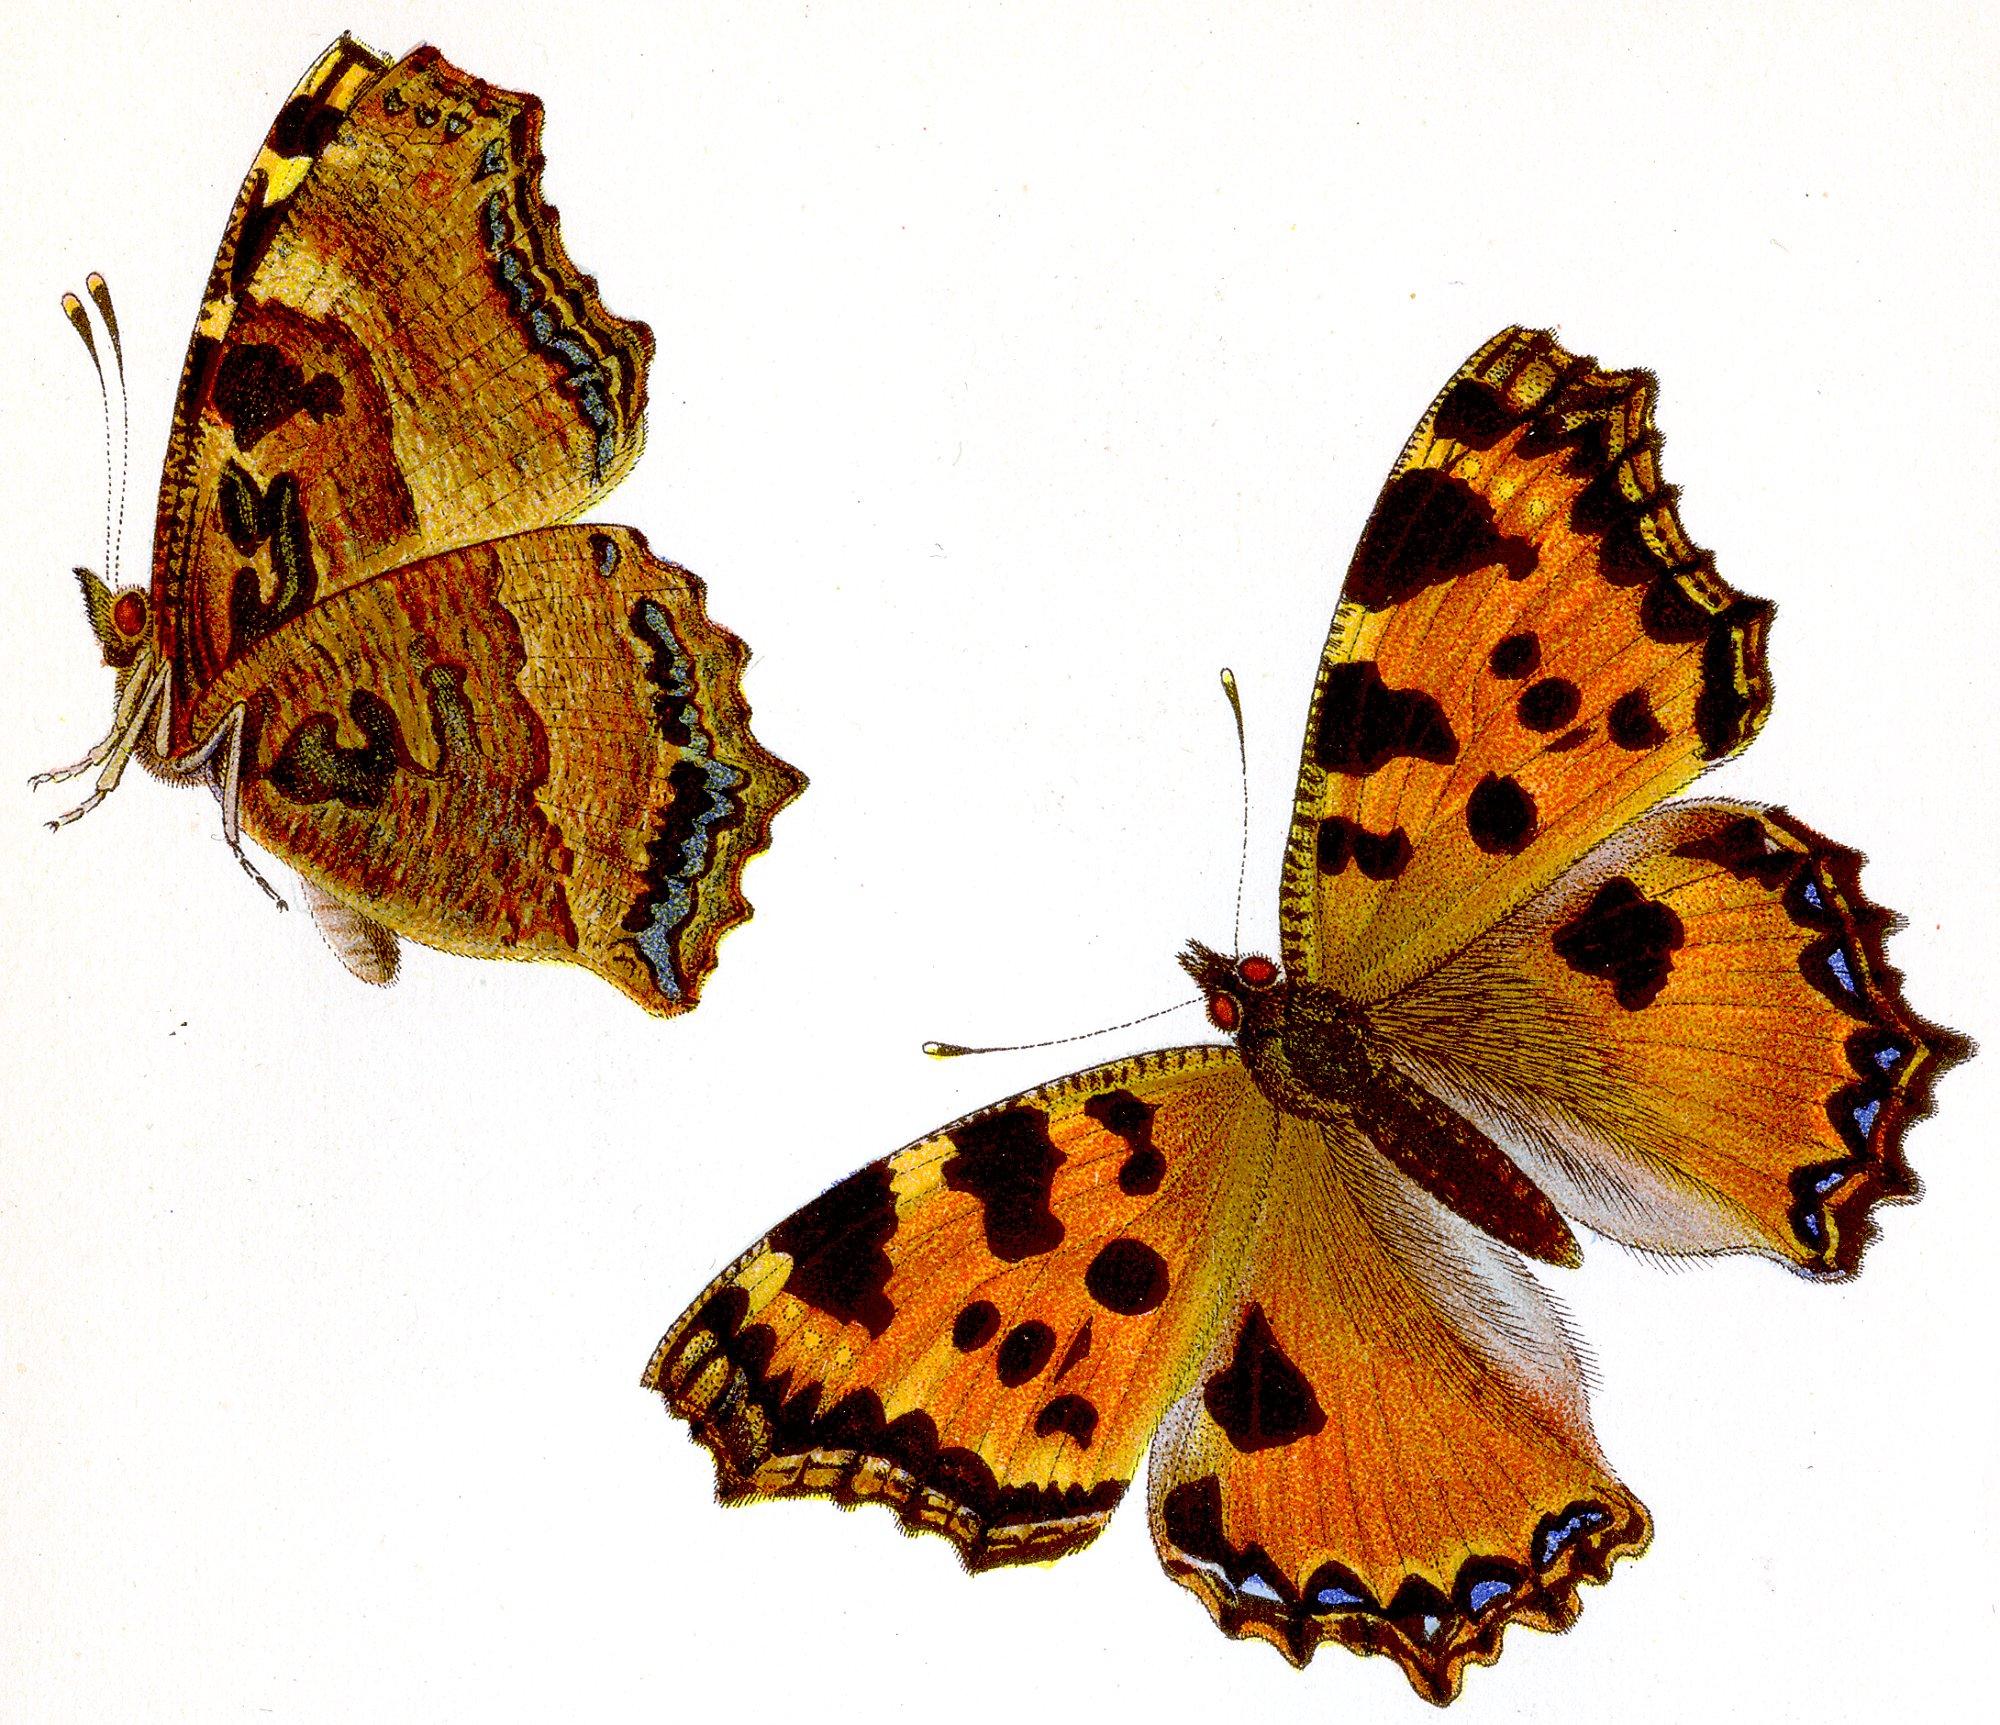 Depiction of Nymphalis polychloros